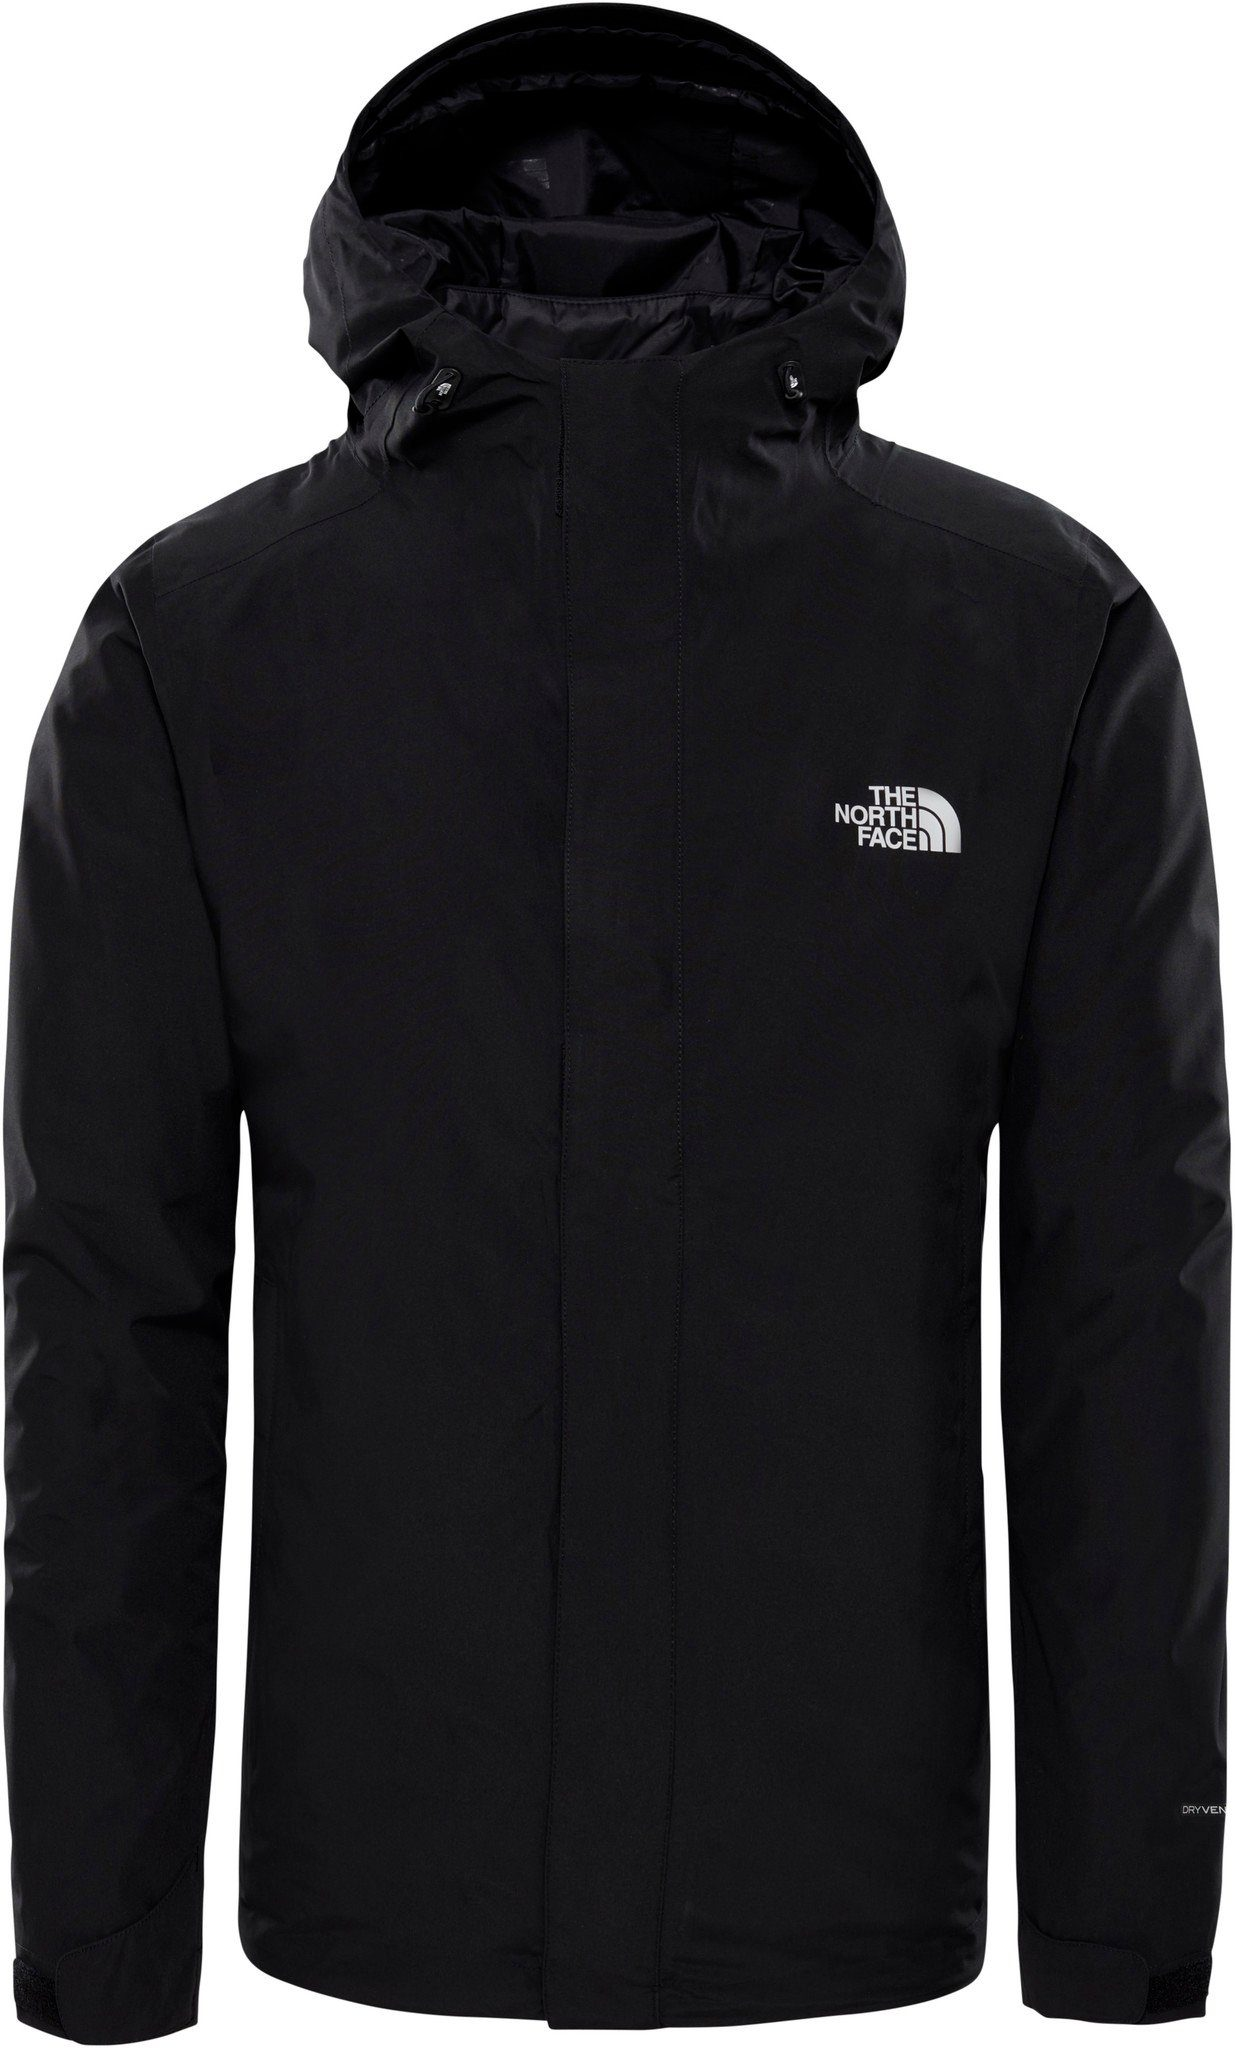 The North Face Outdoorjacke »Merak Triclimate Jacket Men«